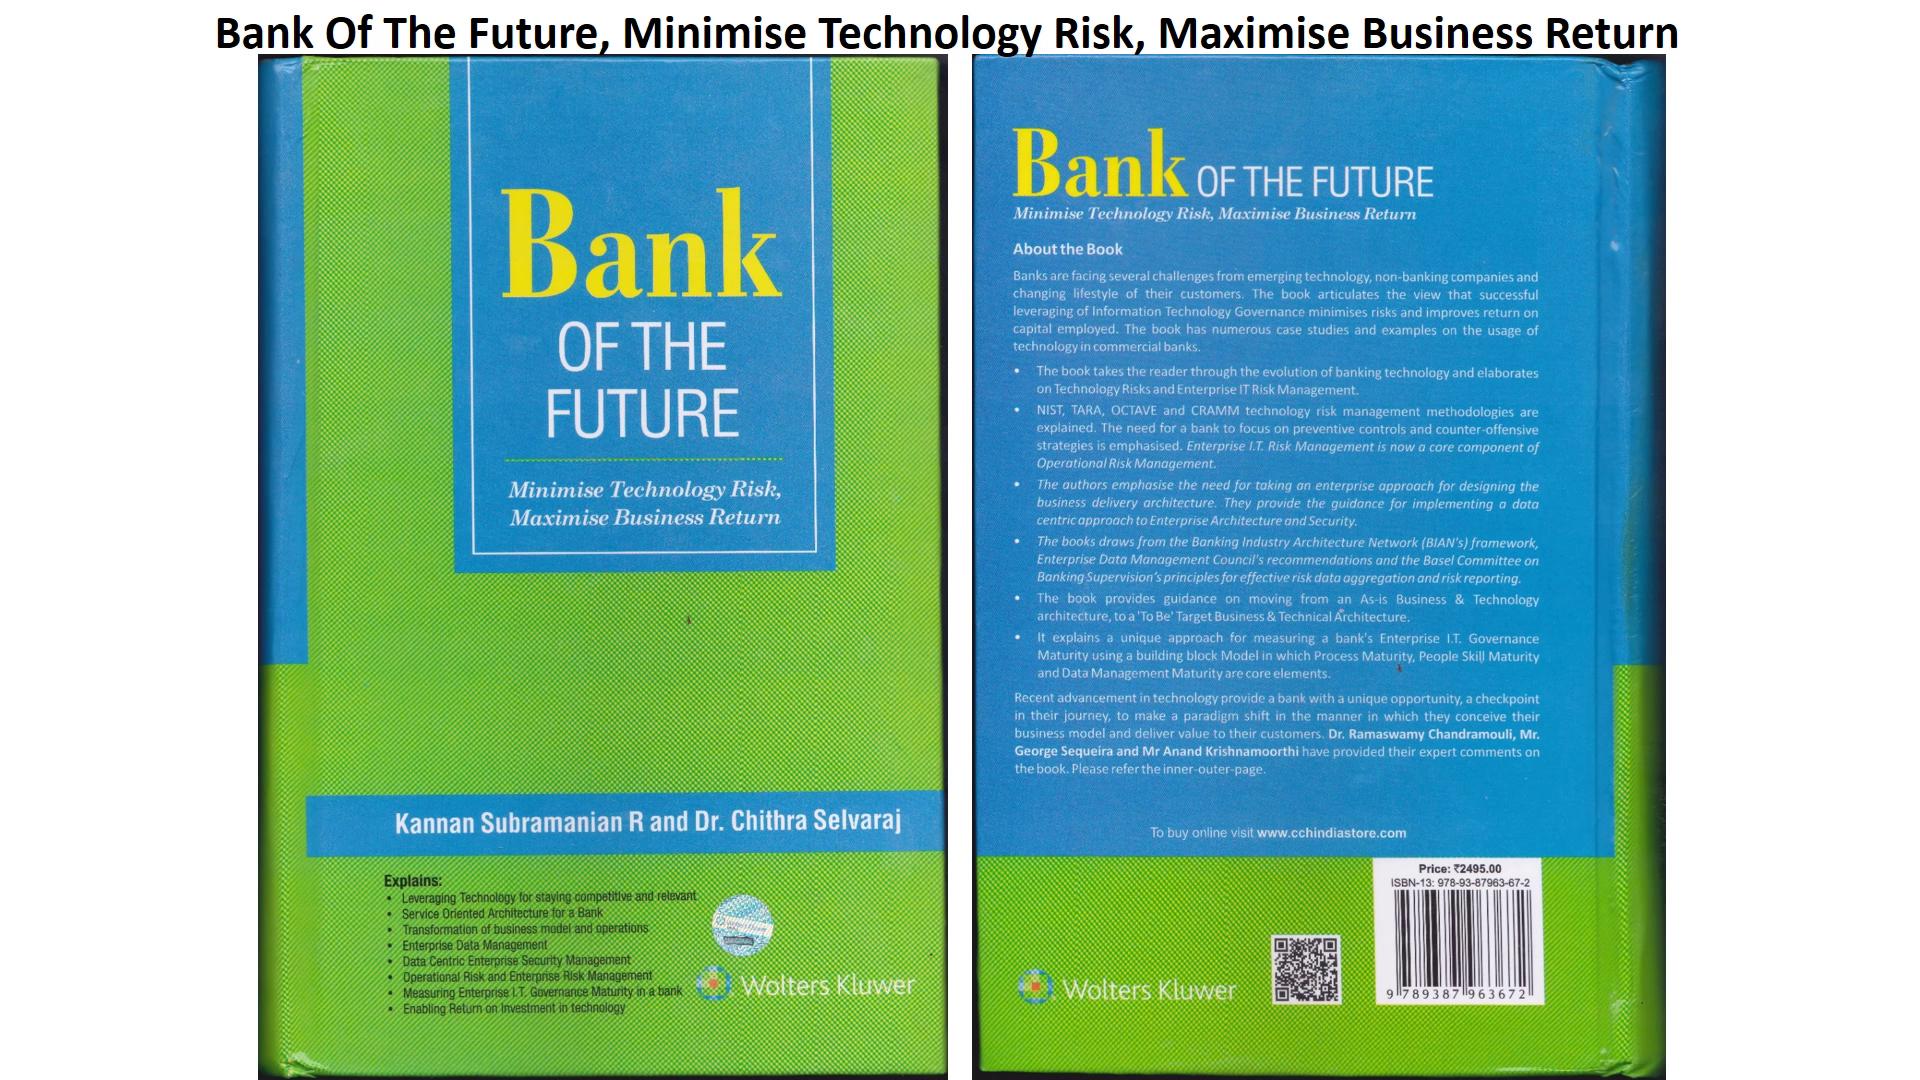 Bank of the Future Min Tech Risk, Max Biz Return